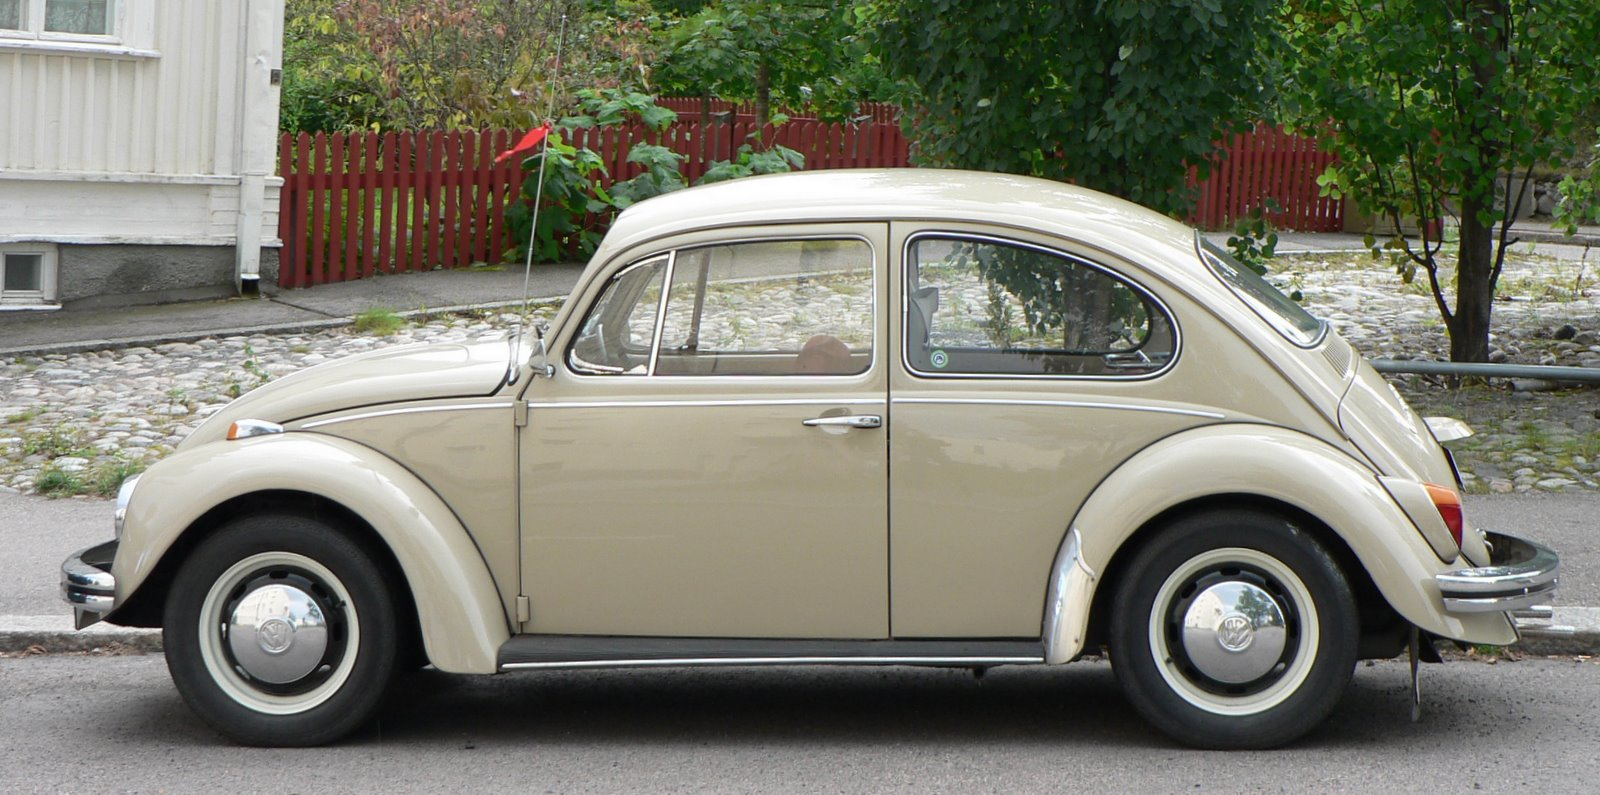 Vw Beetle Car Covers